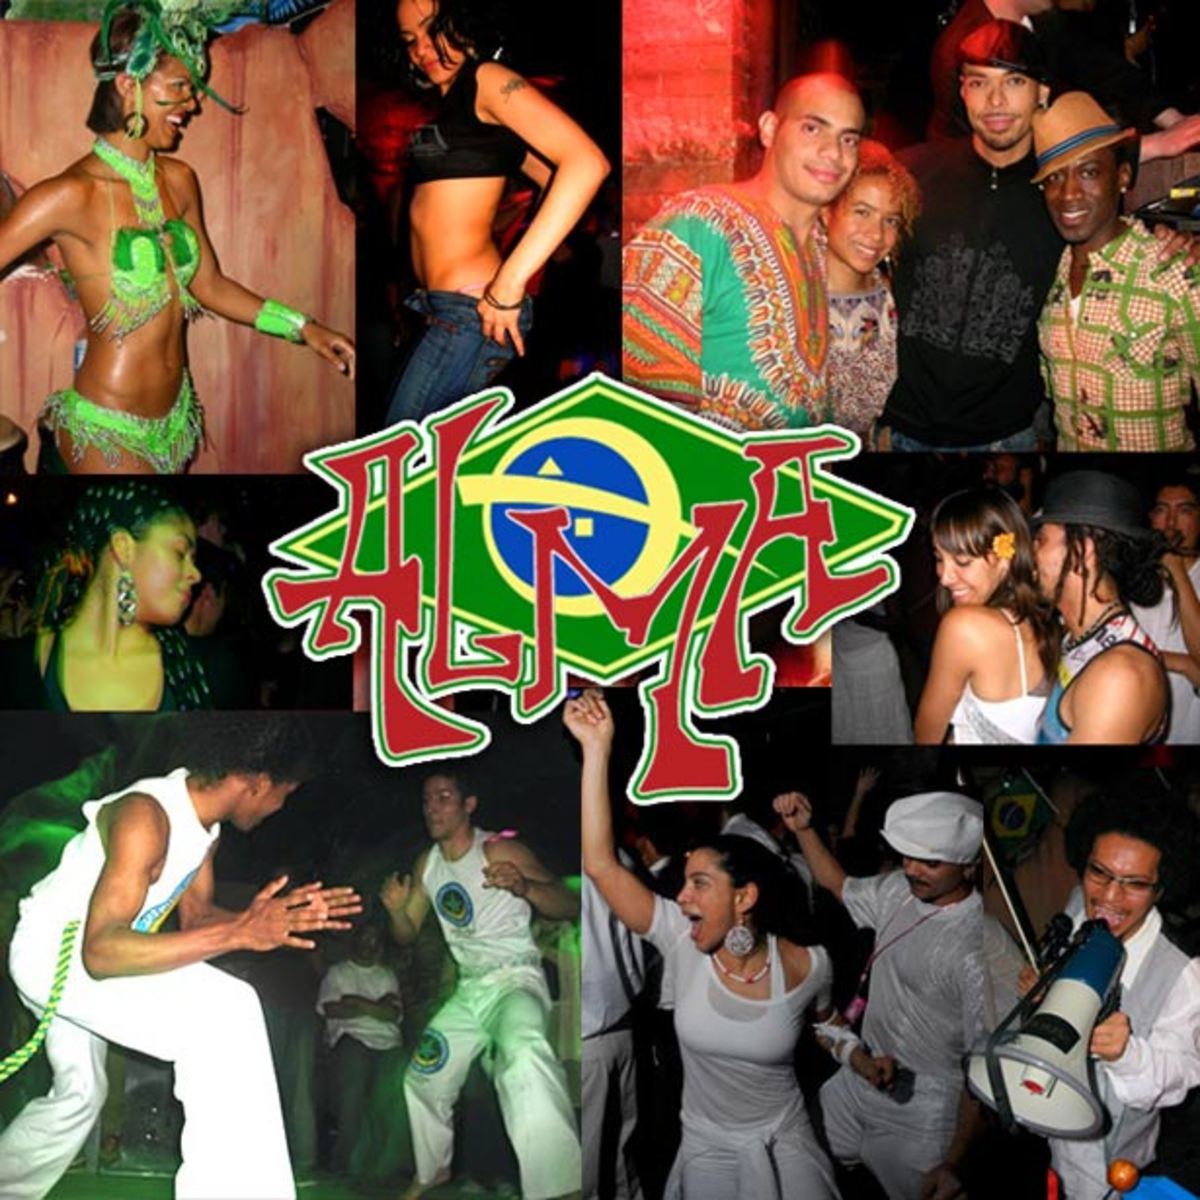 Carnaval in NYC: ALMA Reunion—a True Celebration of Neo-Brazilian Fusion